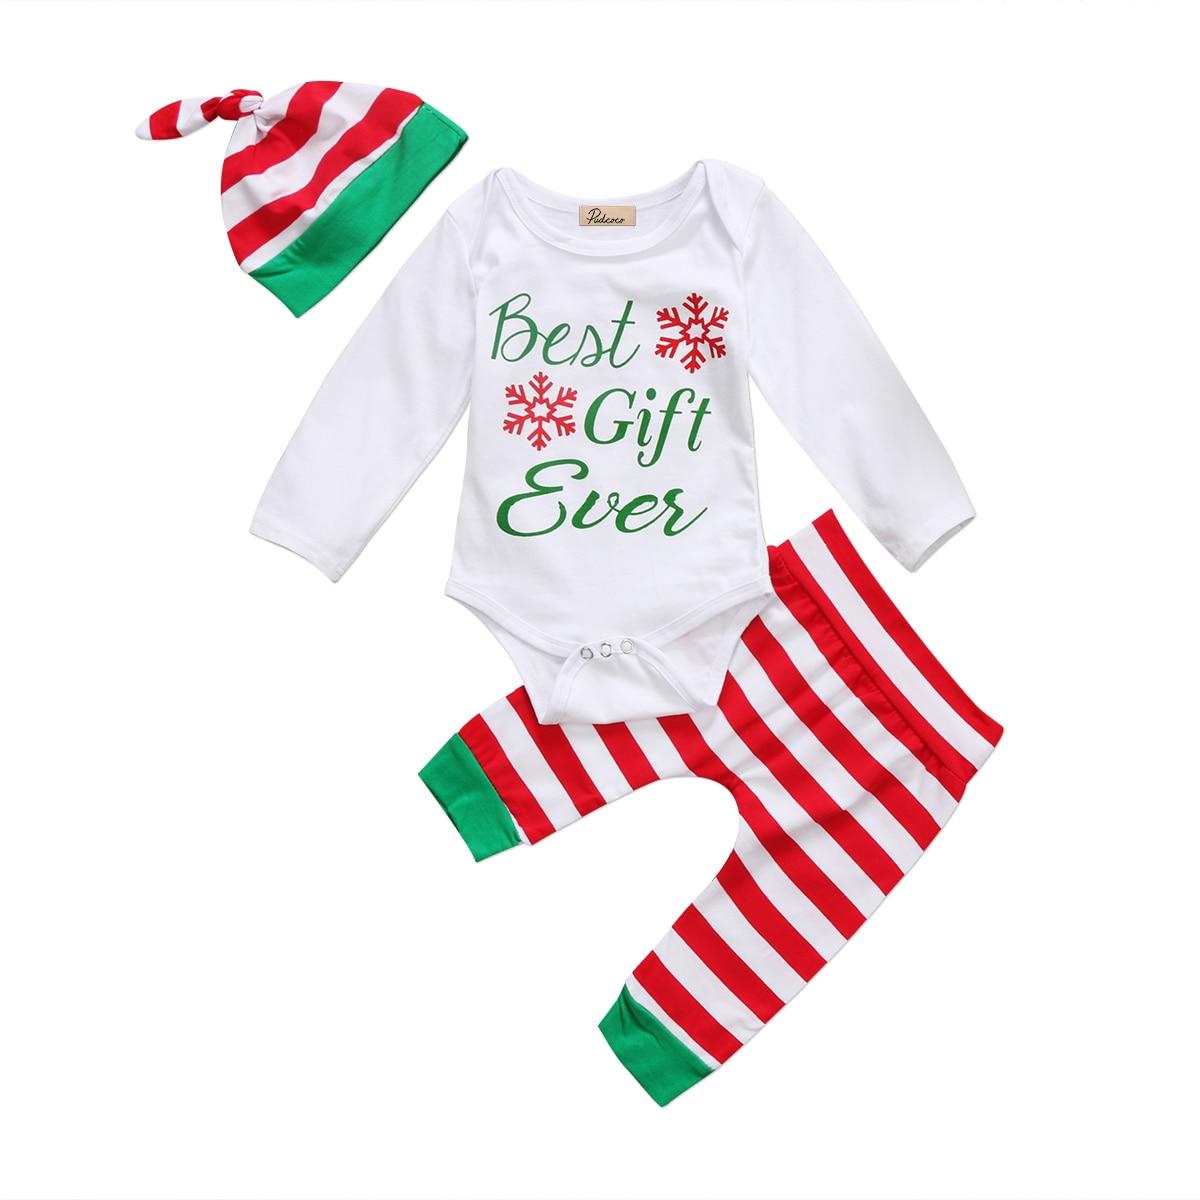 3Pcs New Christmas Newborn Toddler Baby Boys Girls Tops Best Gift Bodysuit Pants Hat Cap Outfits Set Clothes 0-18M